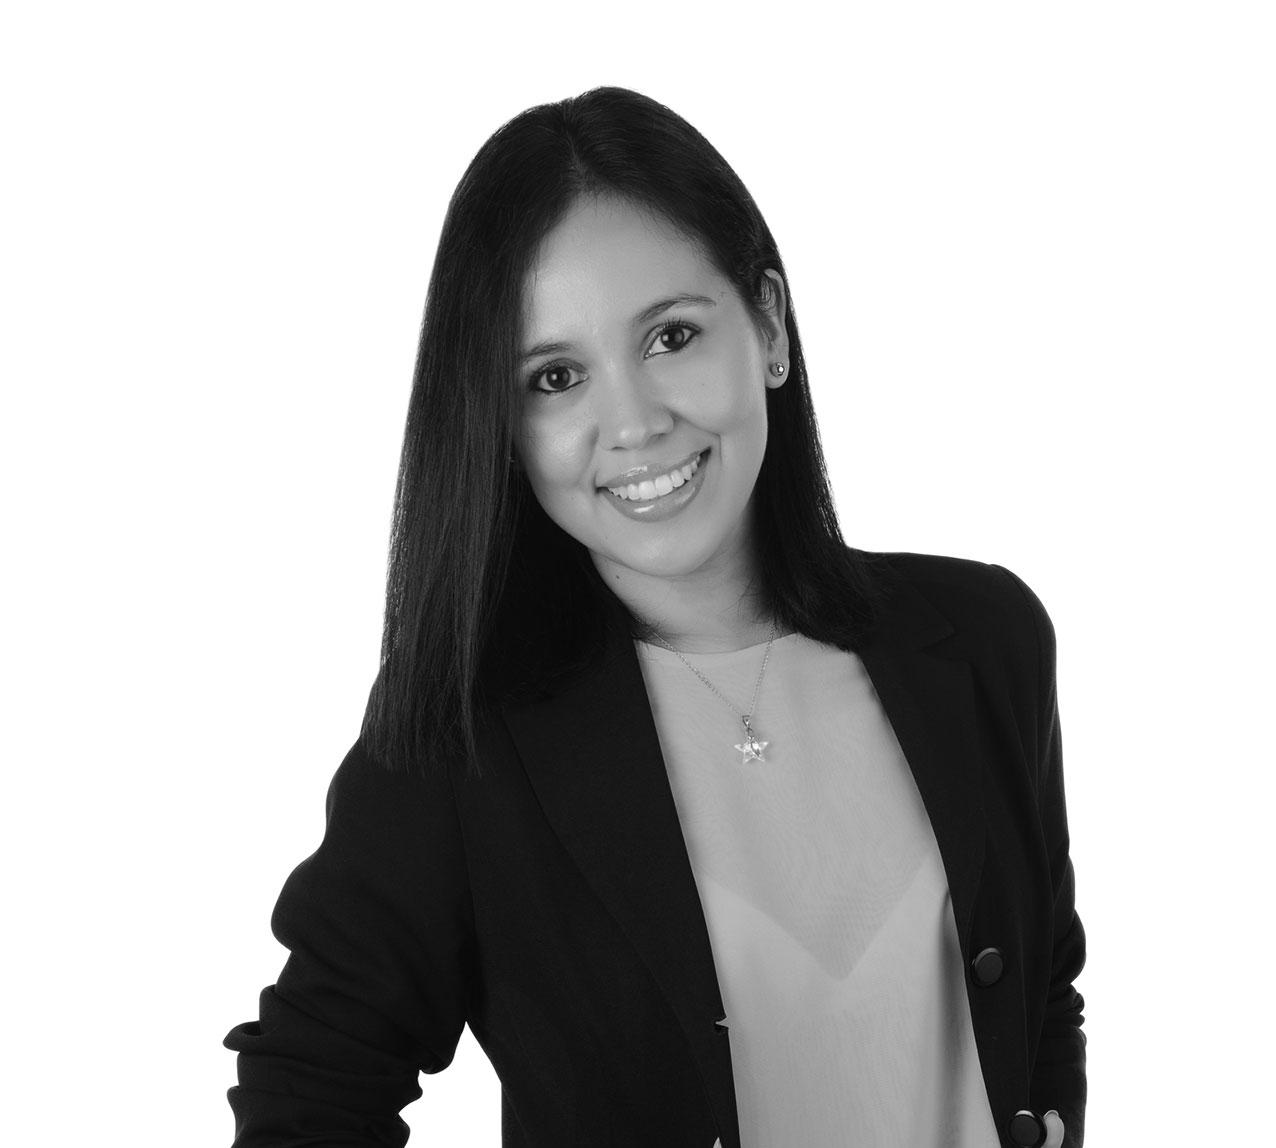 https://suricatalabs.com/wp-content/uploads/2020/04/irene-suarez.jpg